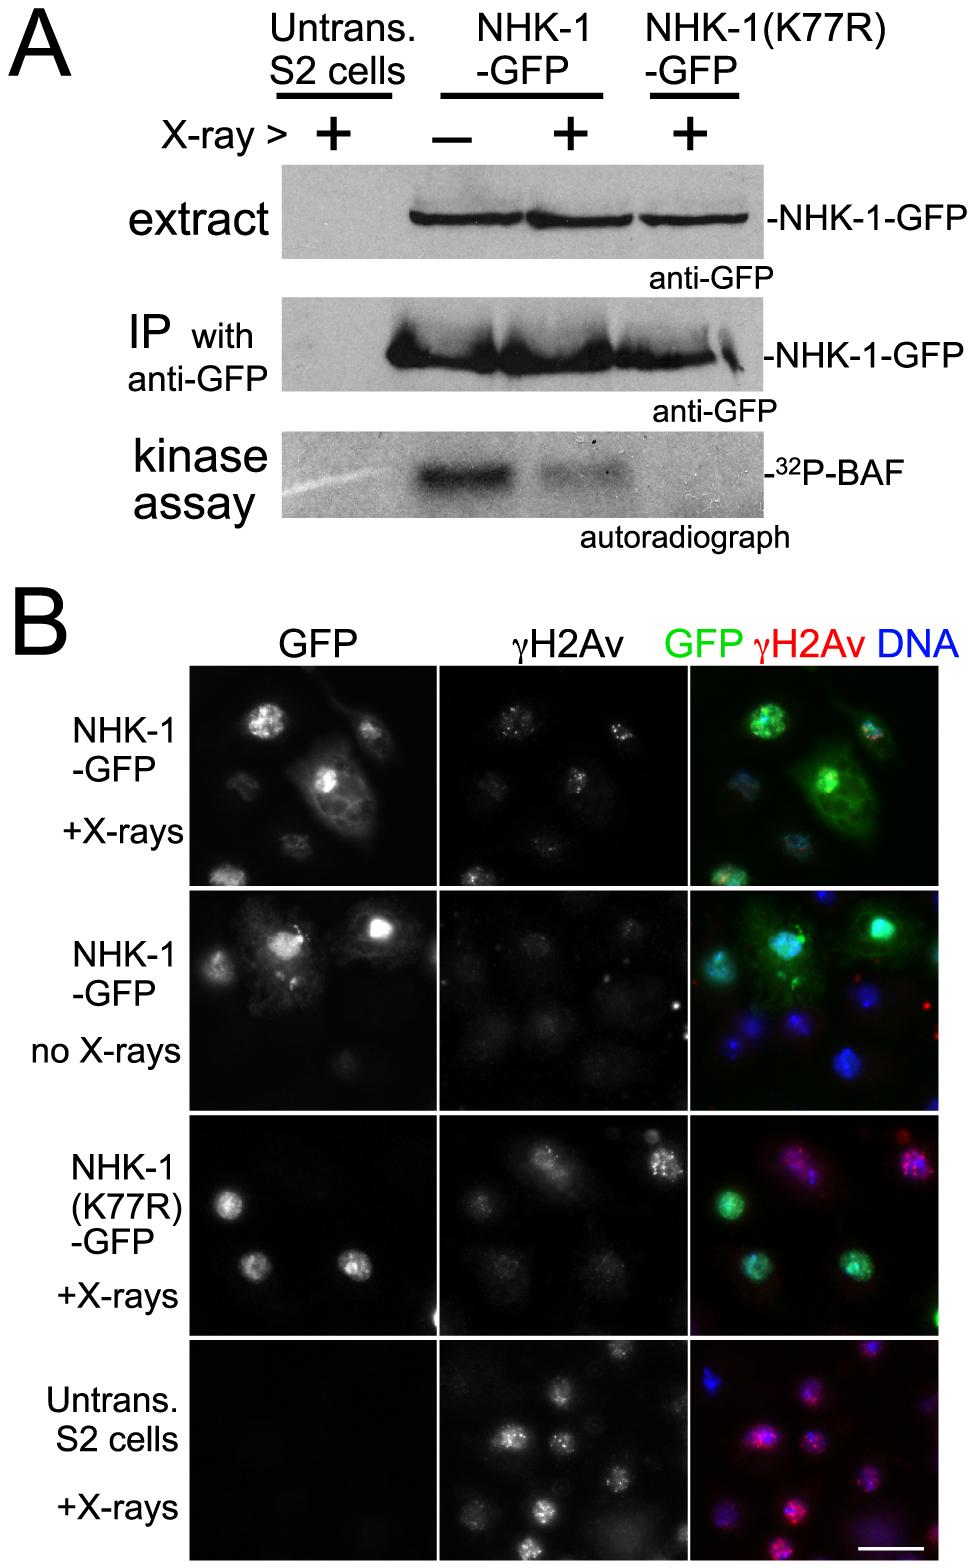 DSBs suppress NHK-1 activity in S2 cells.